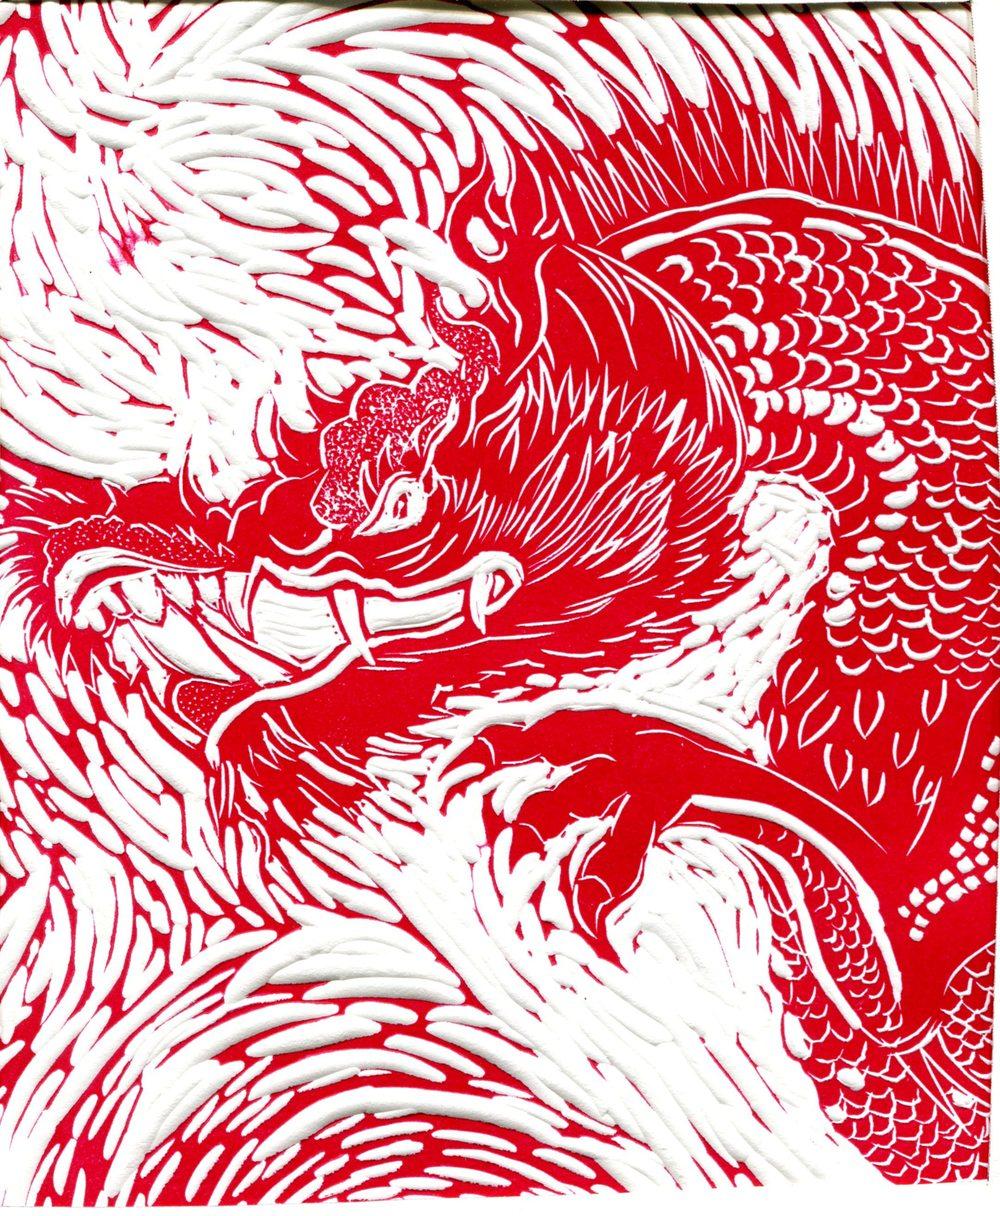 Spencer, Faye    36a Red Dragon, Lino print (fragment).